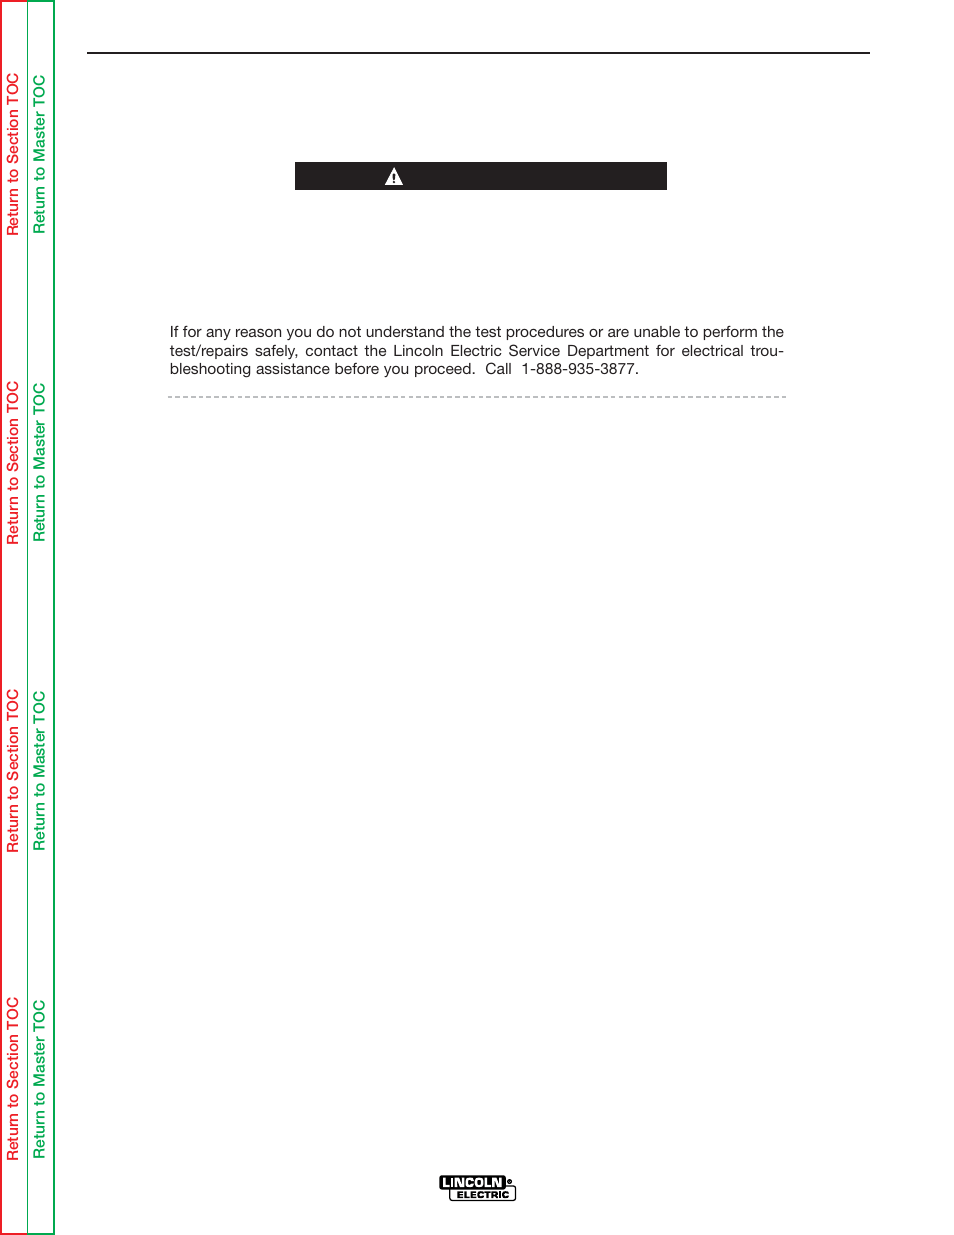 medium resolution of dc bus power supply pc board test f 23 dc bus board